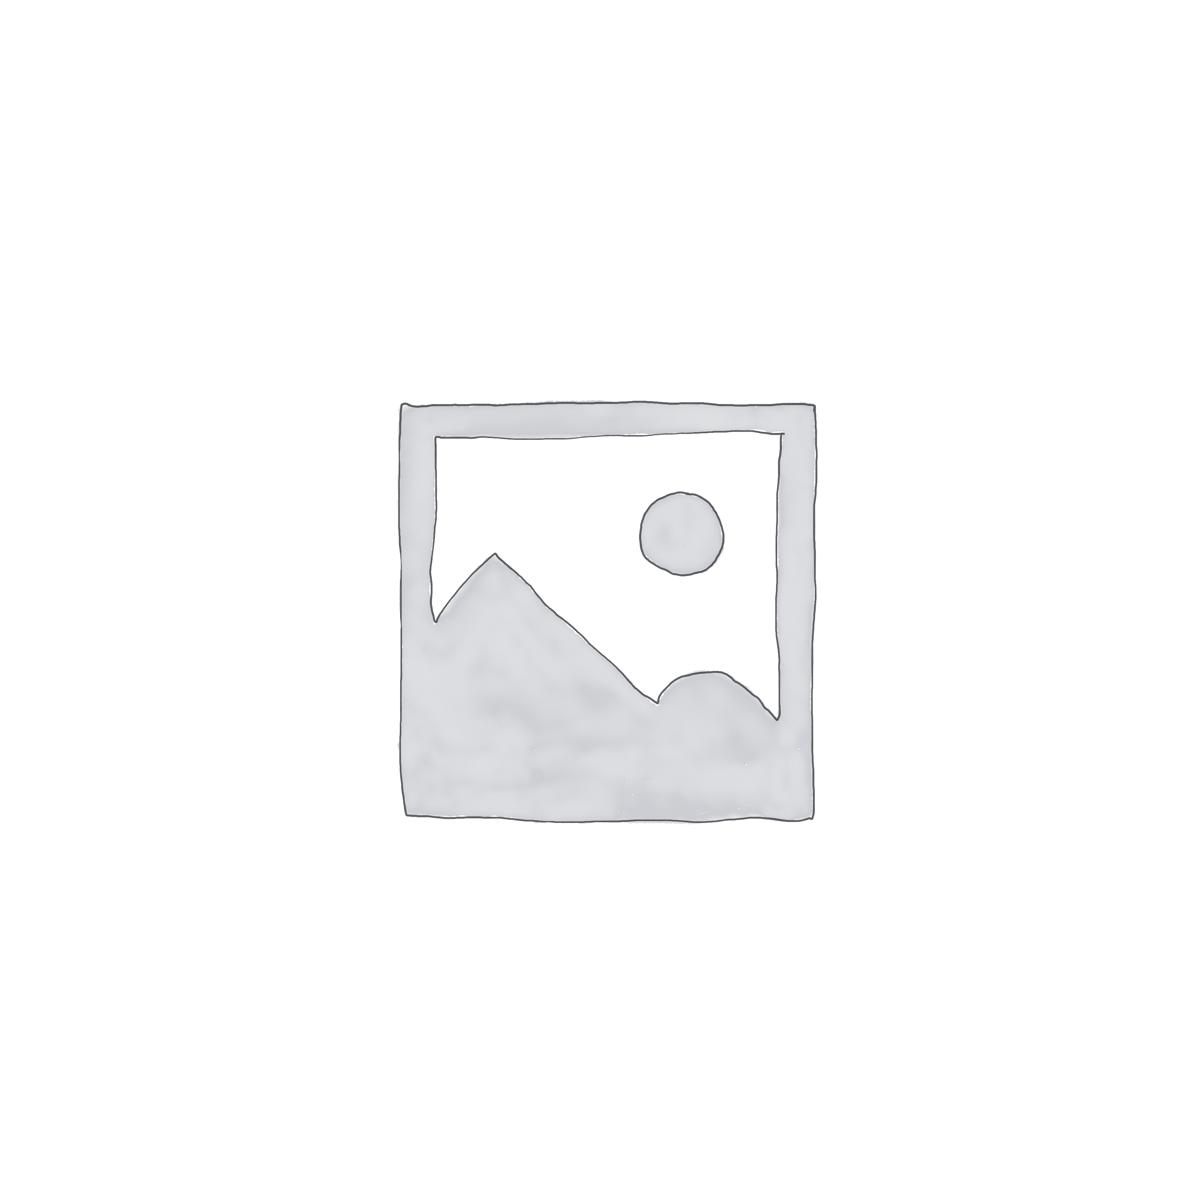 Sky Wallpaper Kids Childrens